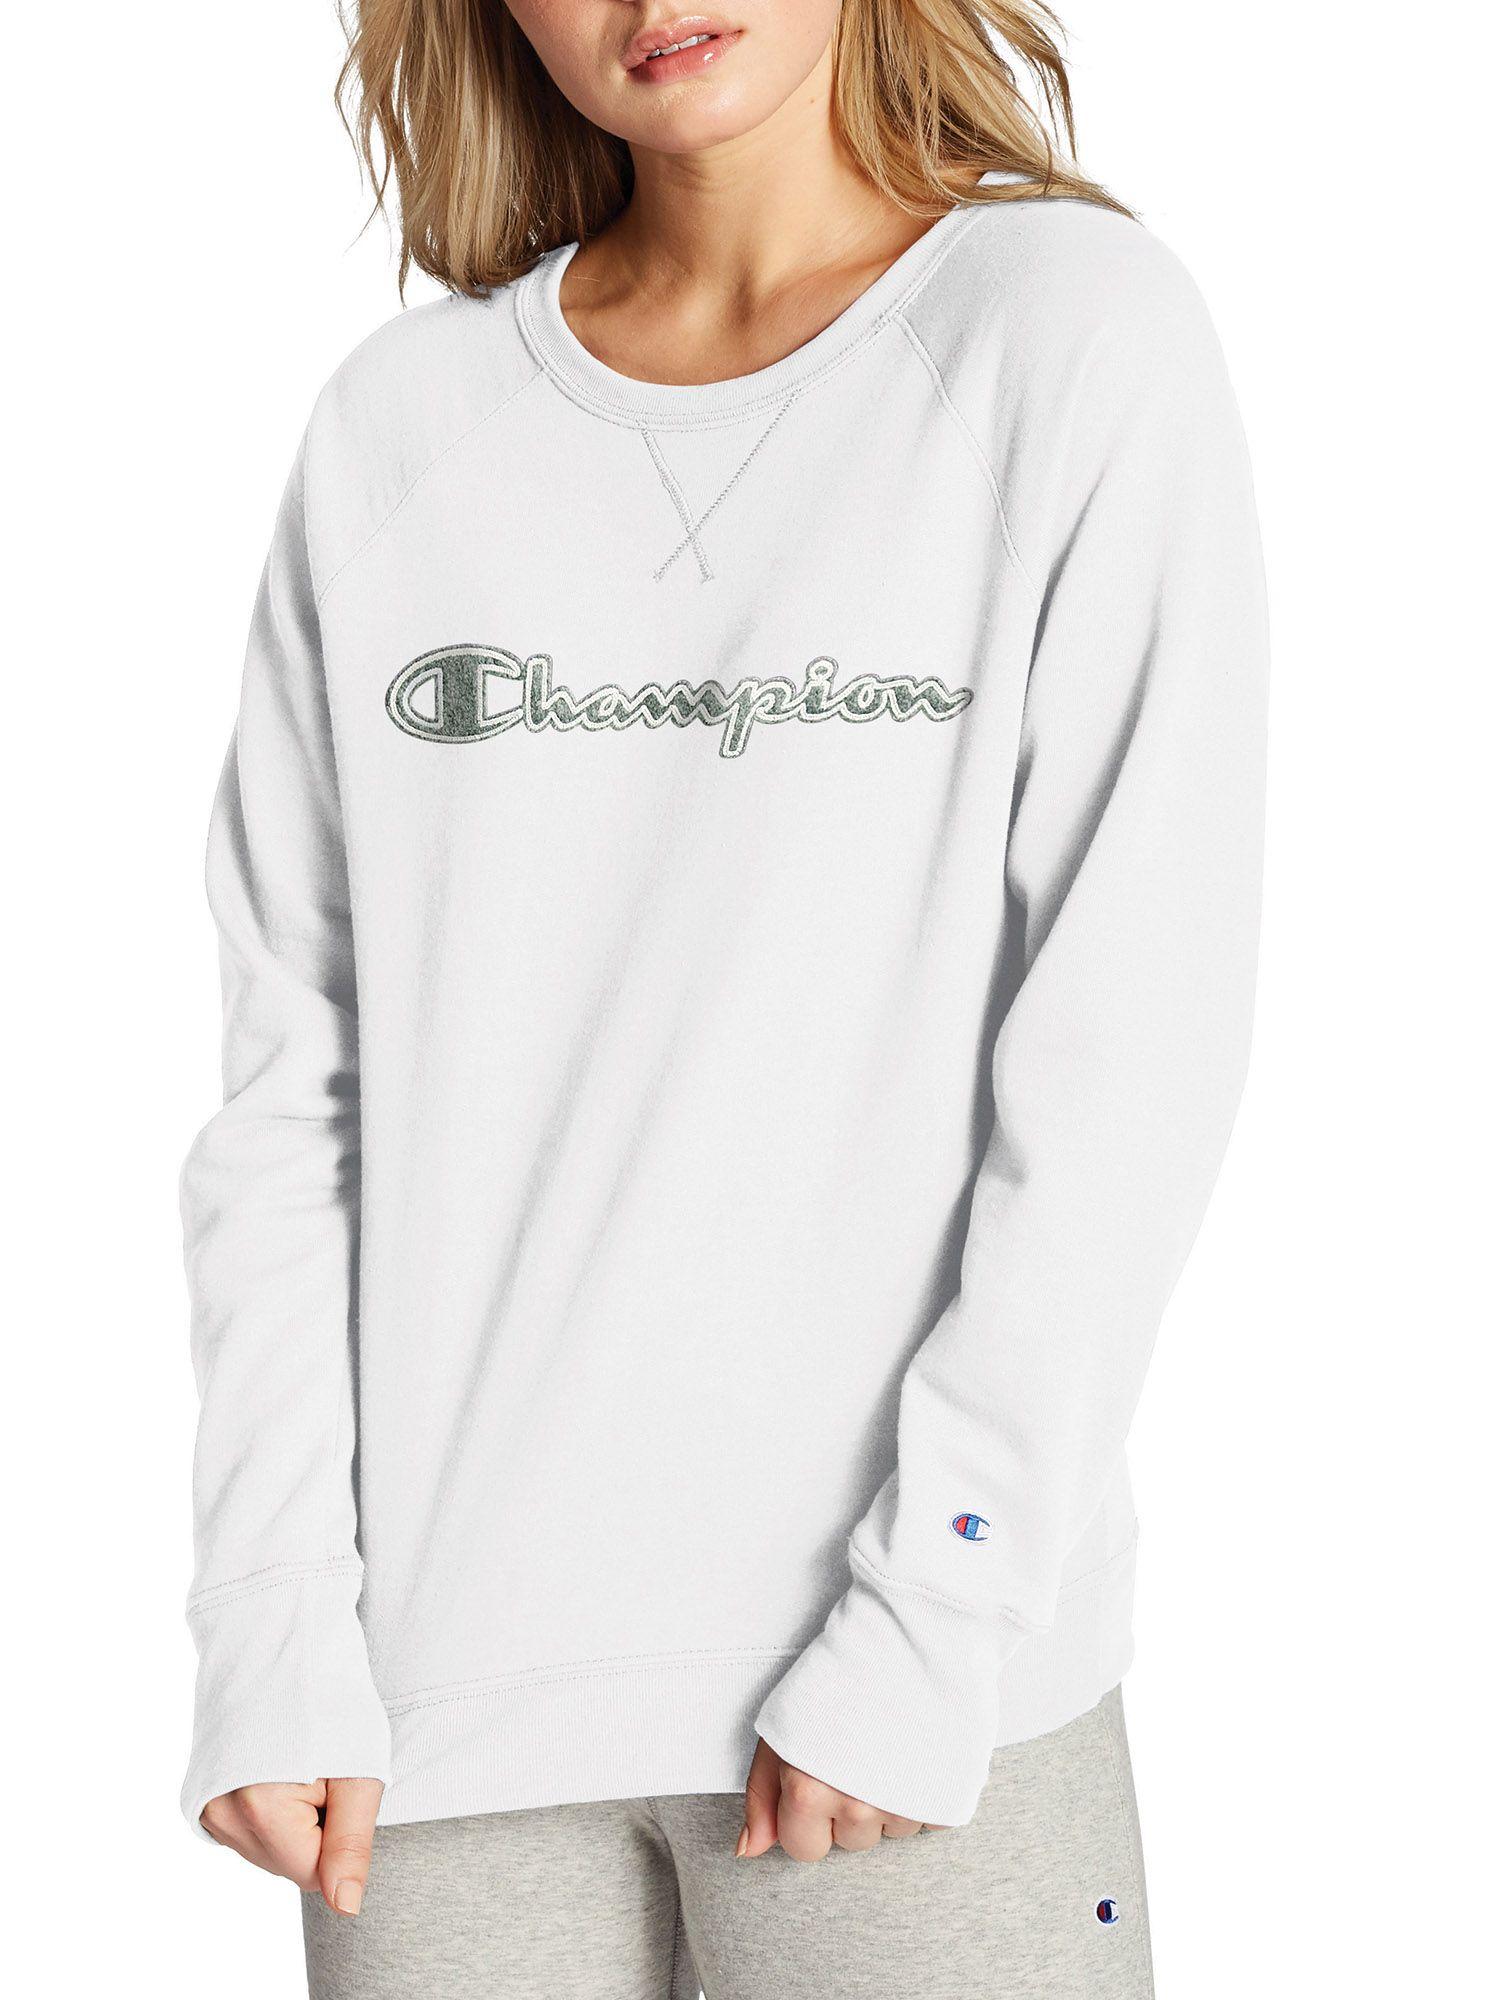 Champion Champion Women S Powerblend Fleece Boyfriend Crew Neck Sweatshirt Applique Walmart Com Crew Neck Sweatshirt Sweatshirts Long Sleeve Sweatshirts [ 2000 x 1500 Pixel ]